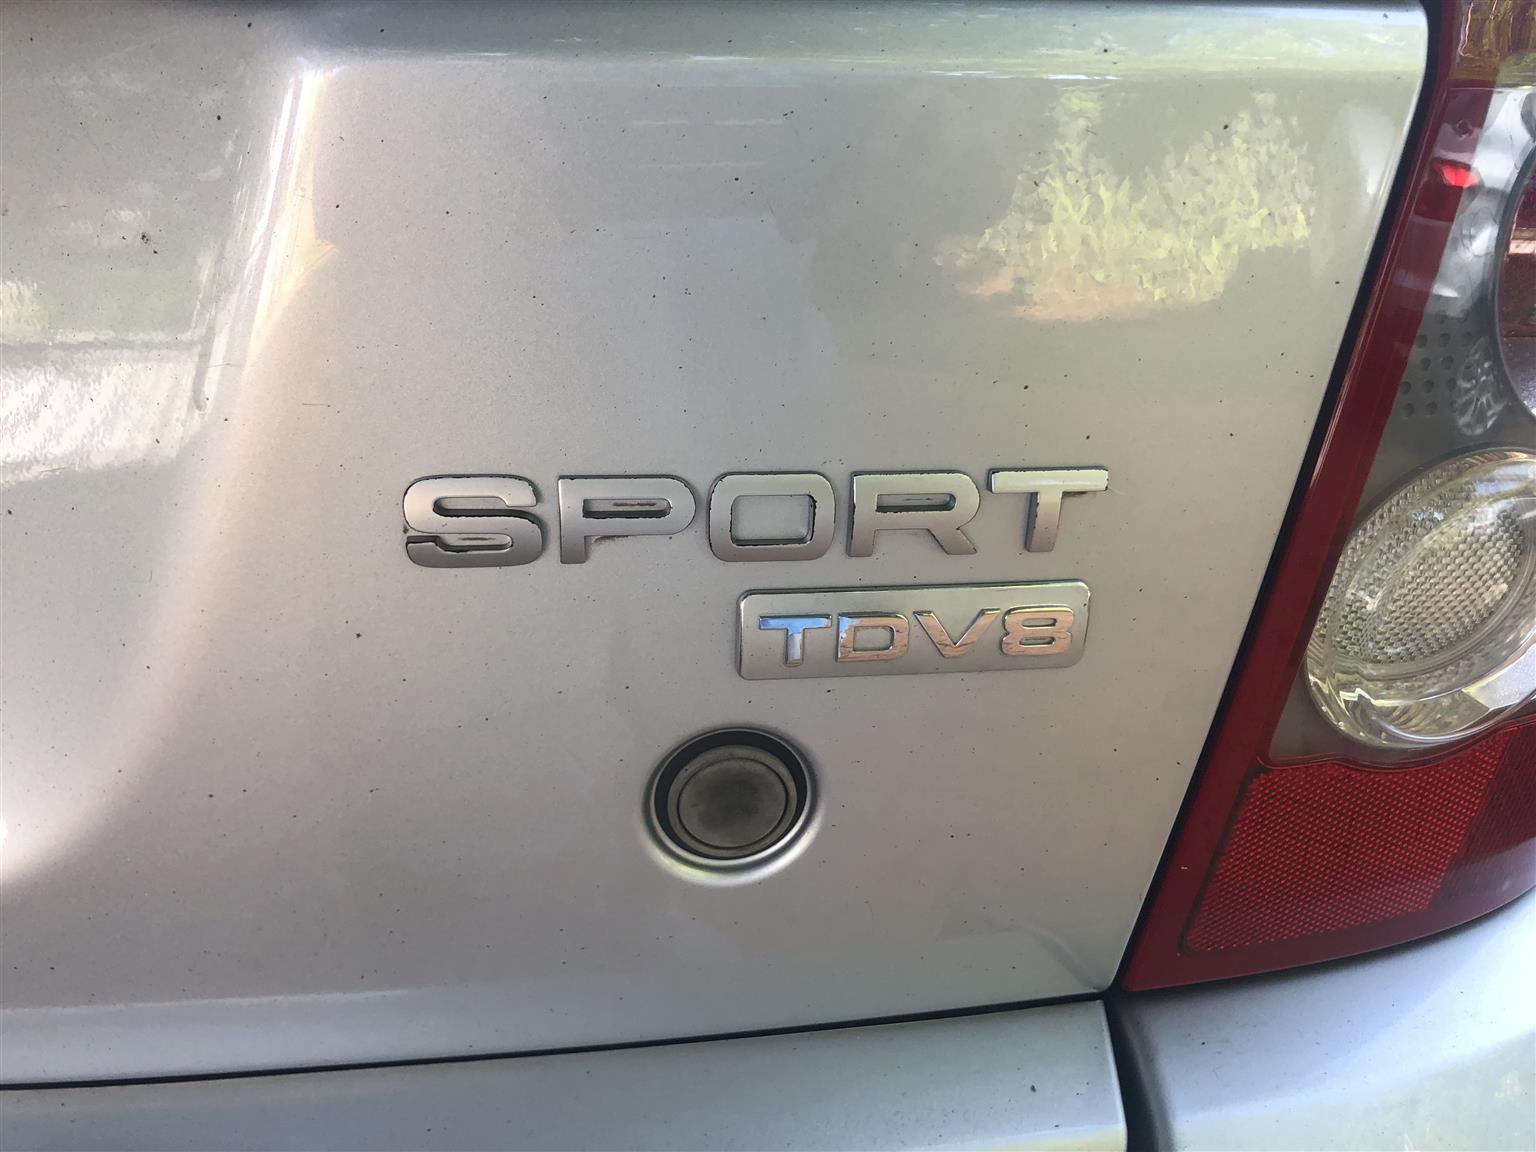 2009 Land Rover Range Rover Sport TDV8 HSE